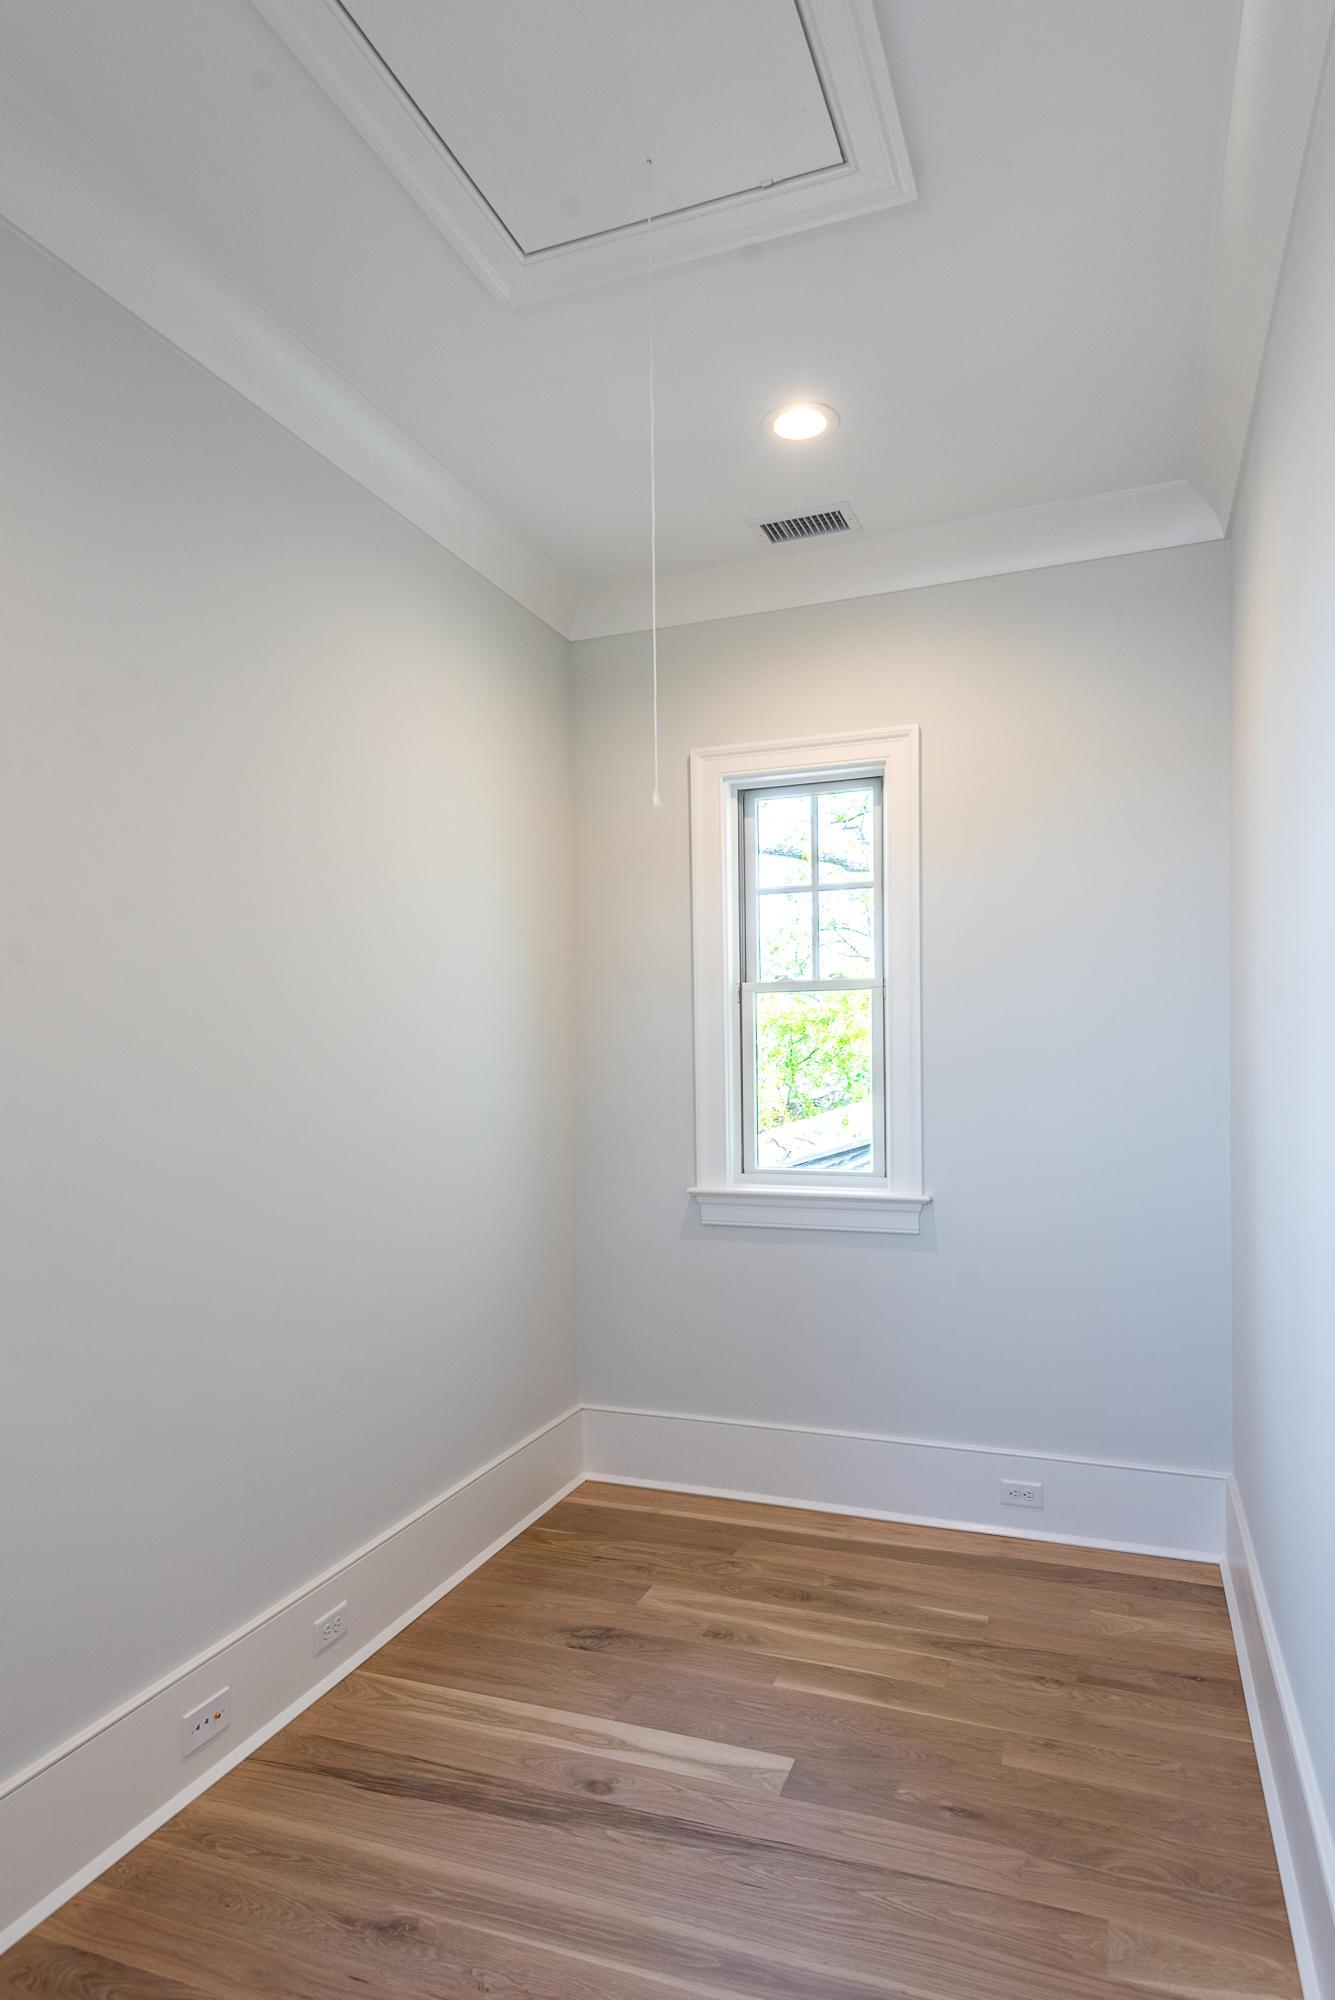 Daniel Island Park Homes For Sale - 449 Lesesne, Charleston, SC - 82